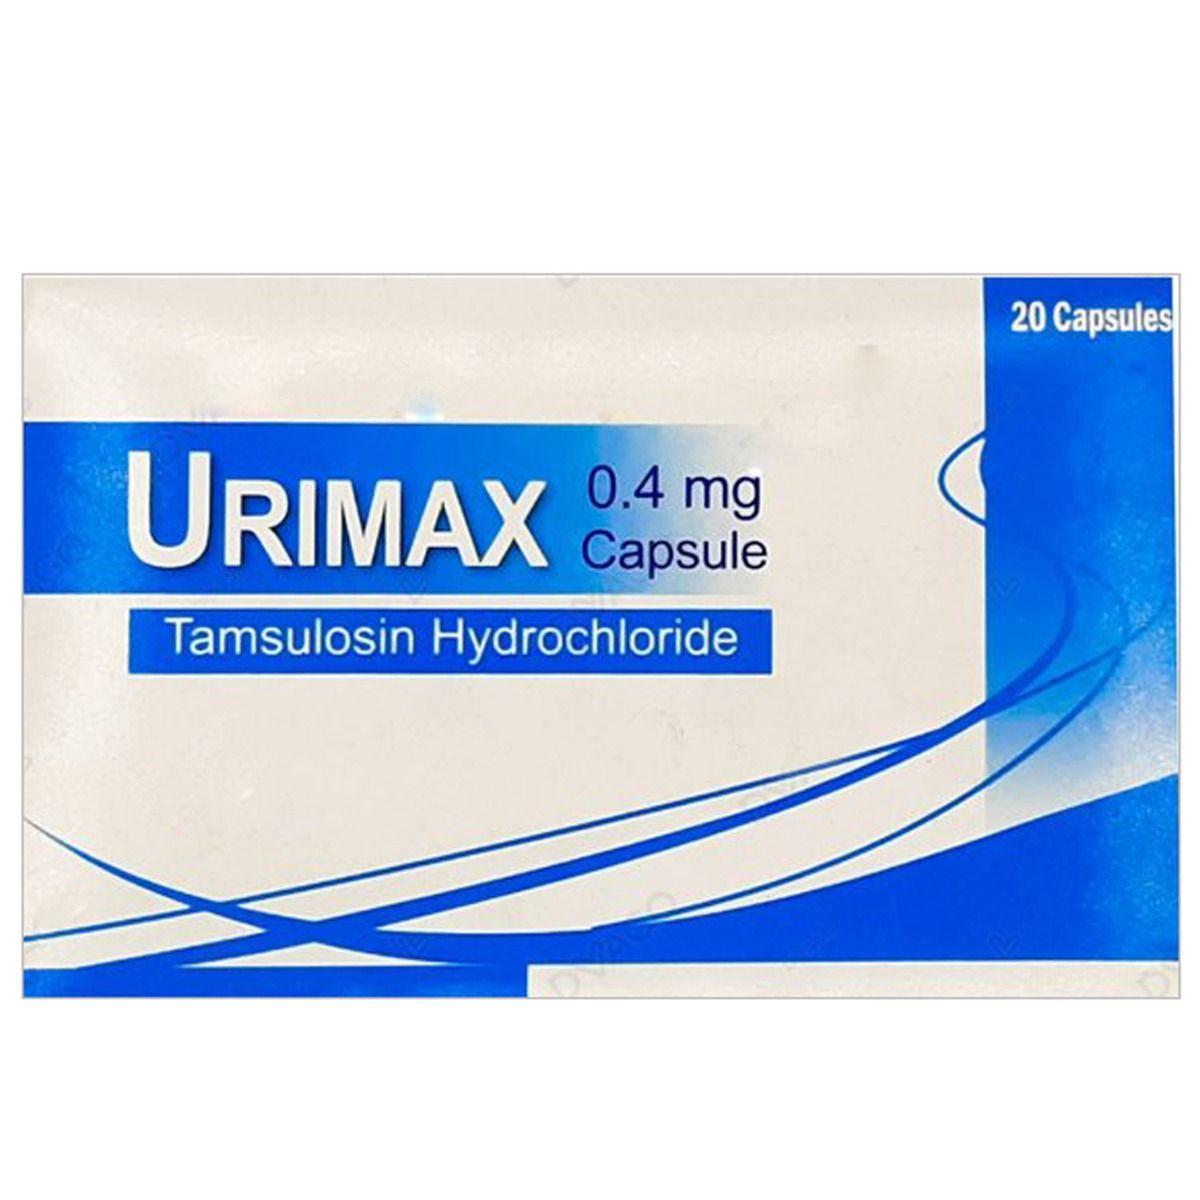 Urimax 0.4 mg Capsule 20's